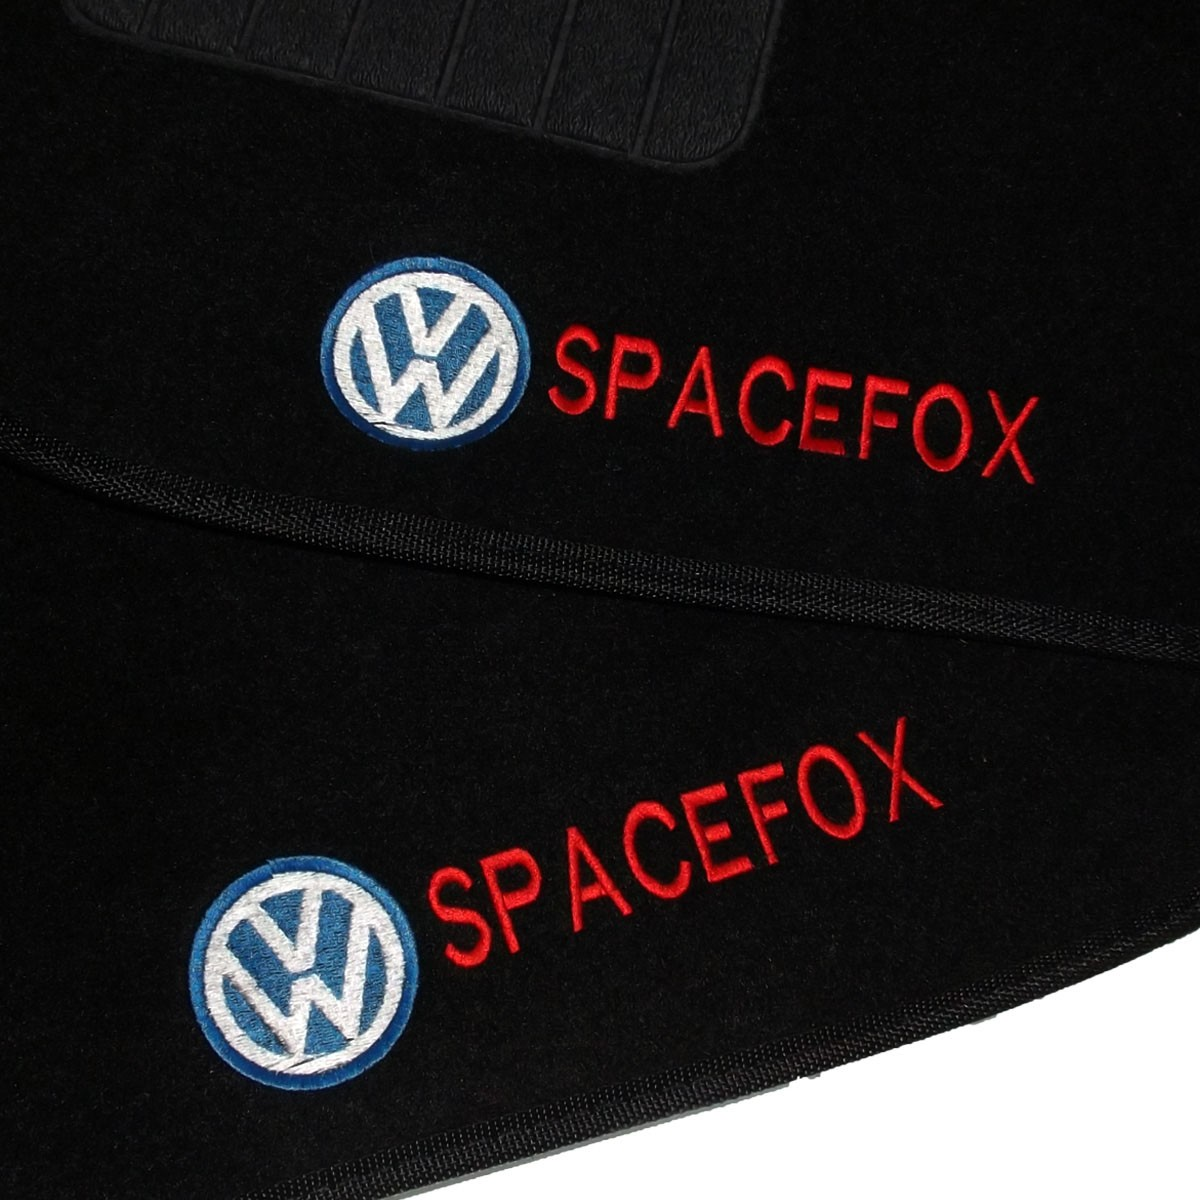 Tapete Carpete Personalizado Logo Bordada Spacefox 2005 até 2015